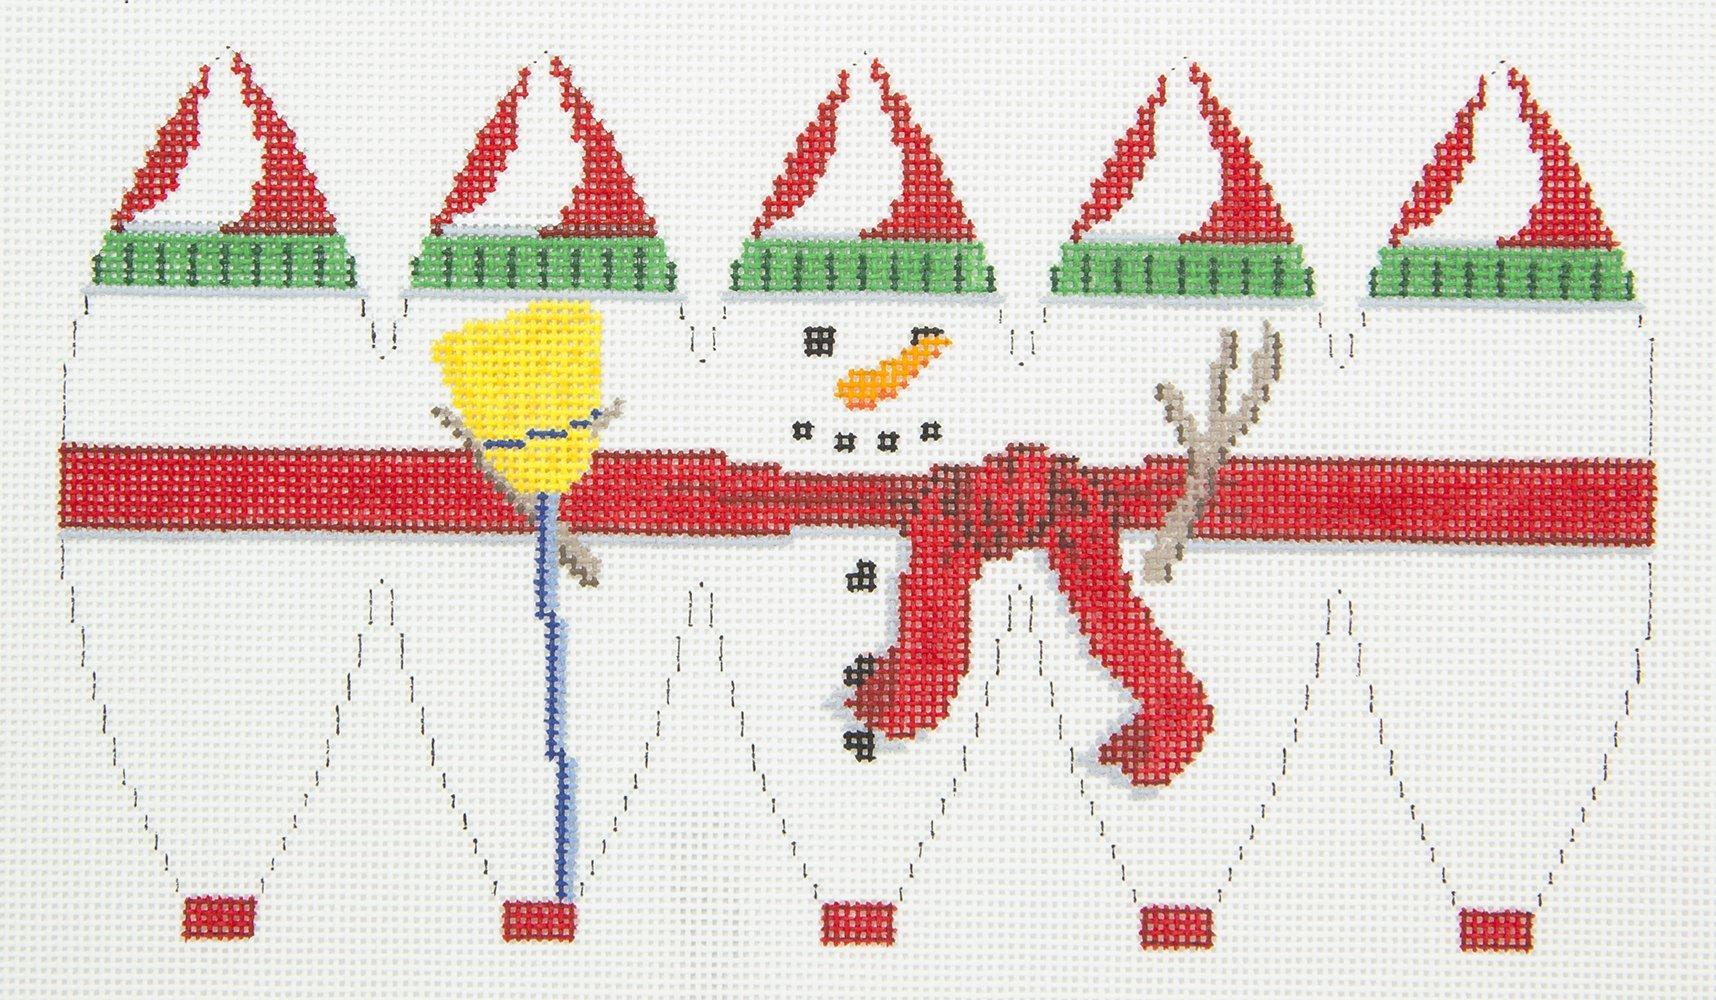 SR5282 Snowman Ornament 3D Hot Air Balloon Susan Roberts